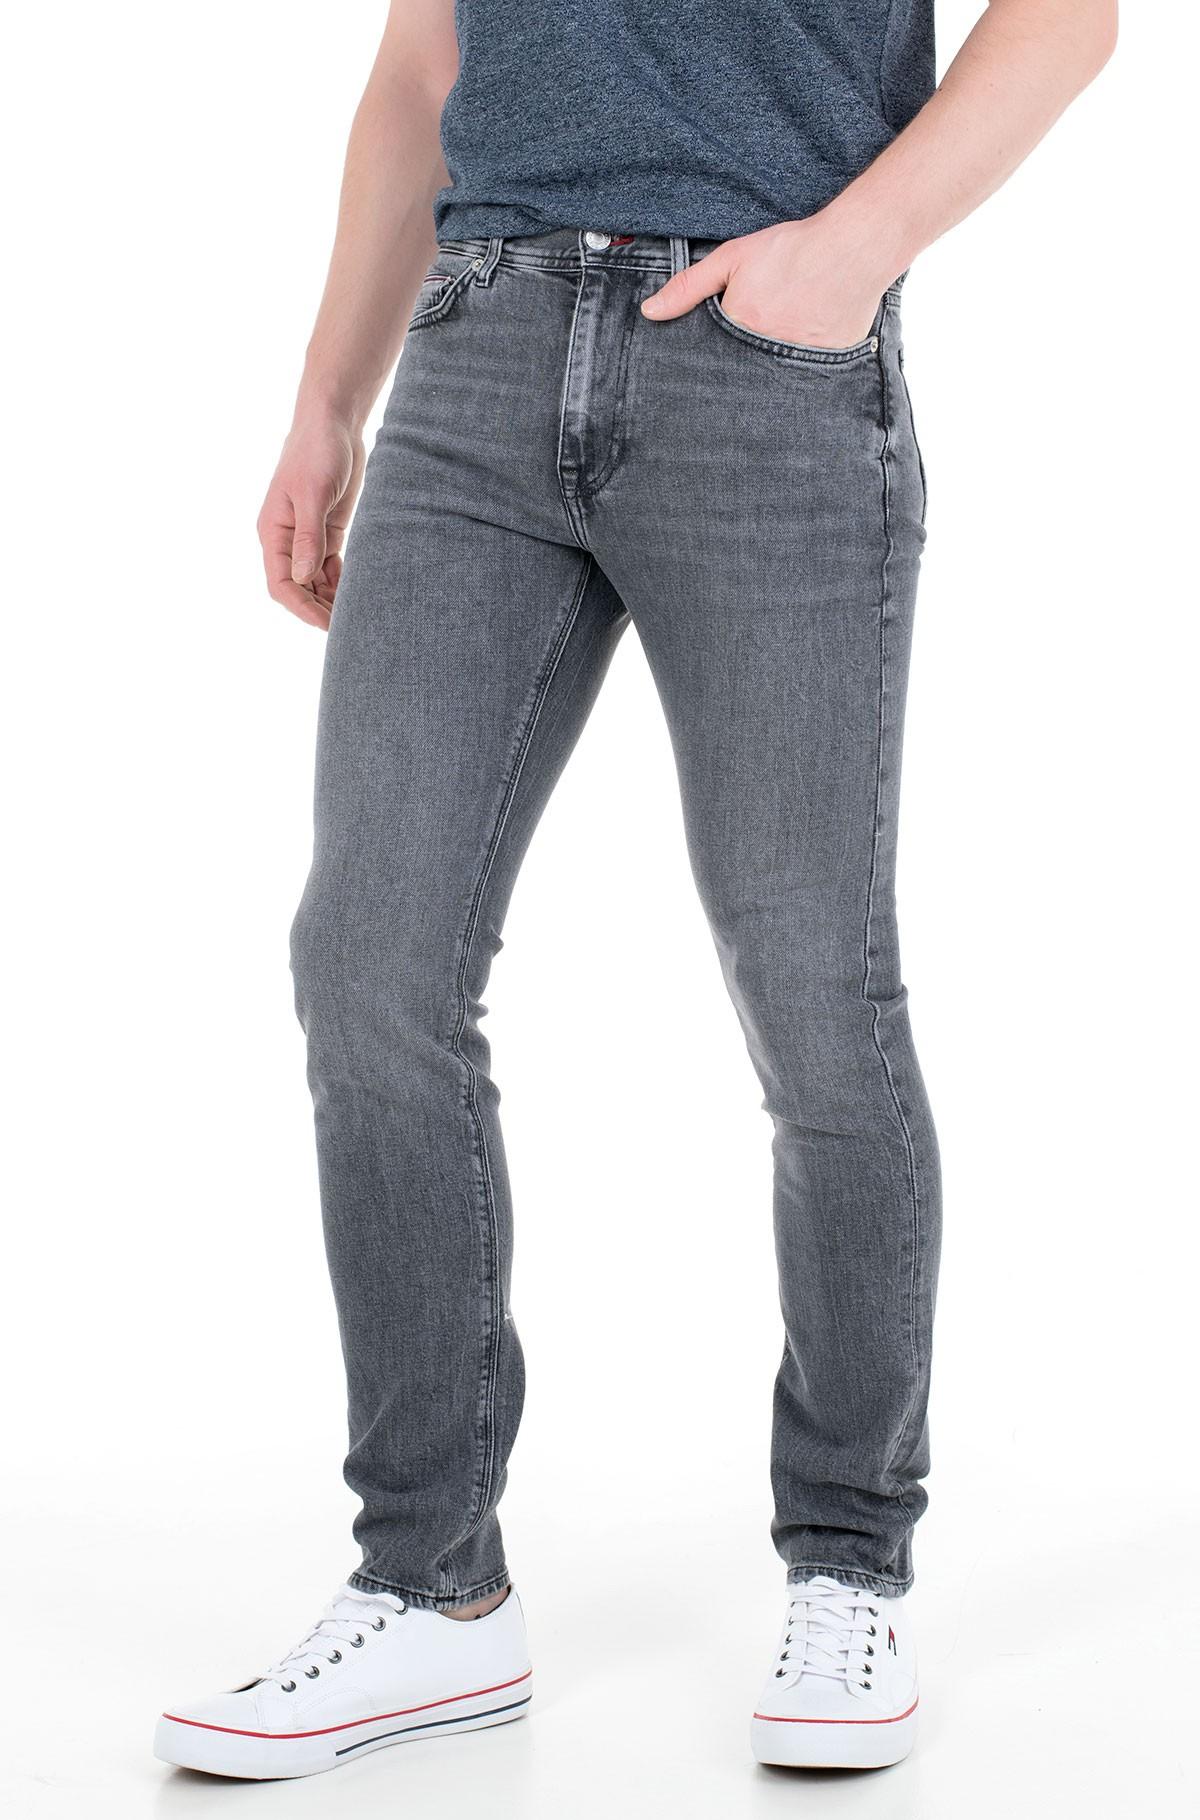 Jeans SLIM BLEECKER STR MISSOURI GREY-full-1